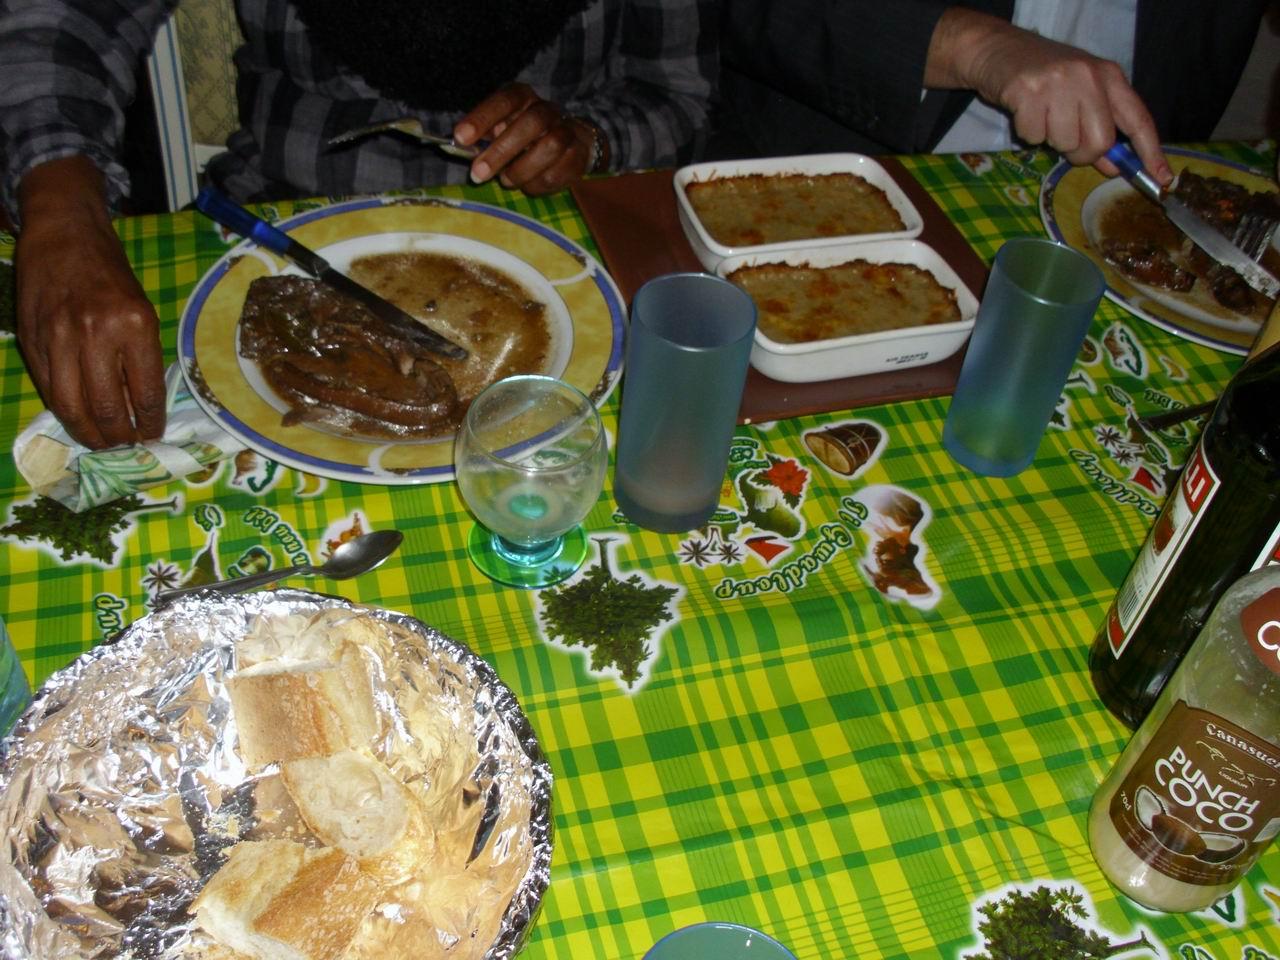 Recettes du chef un repas entre amis for Entree sympa entre amis